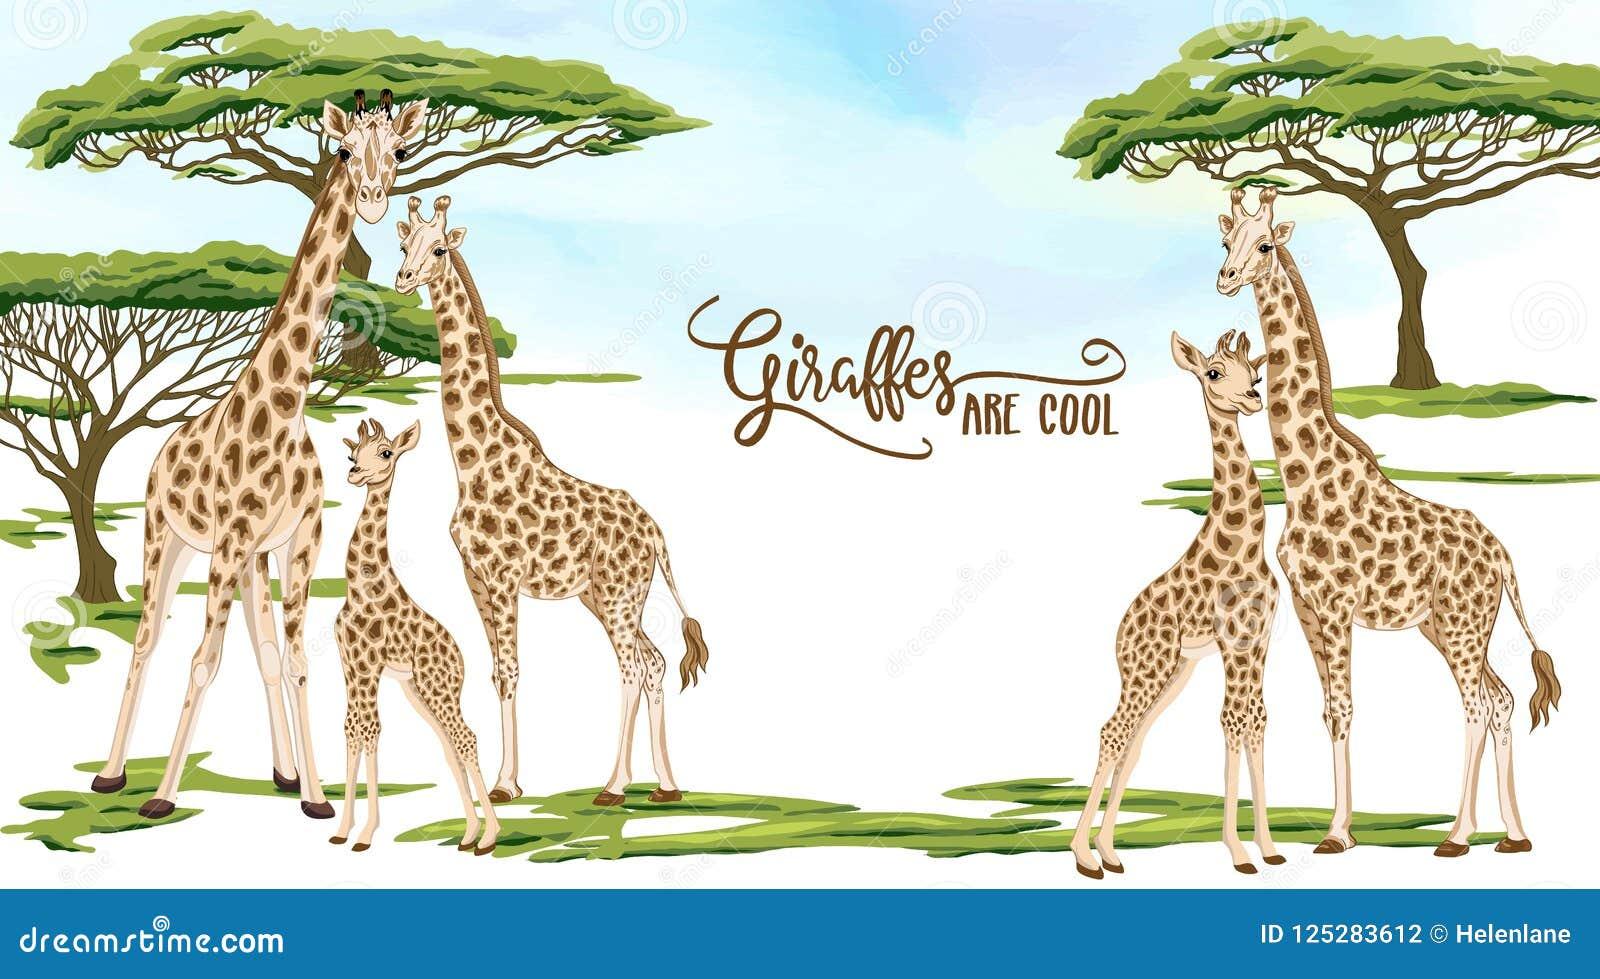 Background With Giraffe Family. Vector Illustration. Stock Vector ...